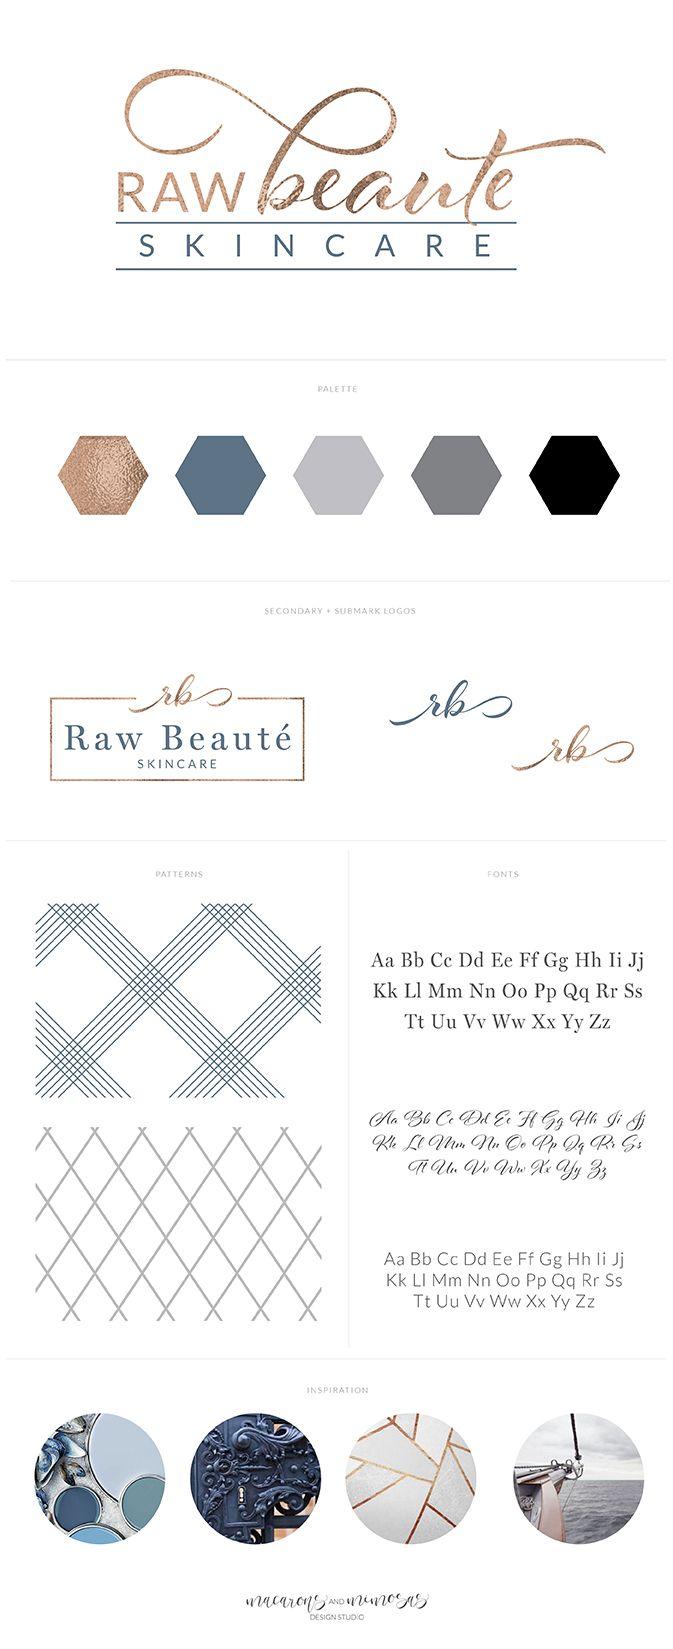 skincare logo branding, blue copper navy blue brand board, health and wellness logo, spa logo. navy, gold, turquoise, logo design, stationery, marble, botanical